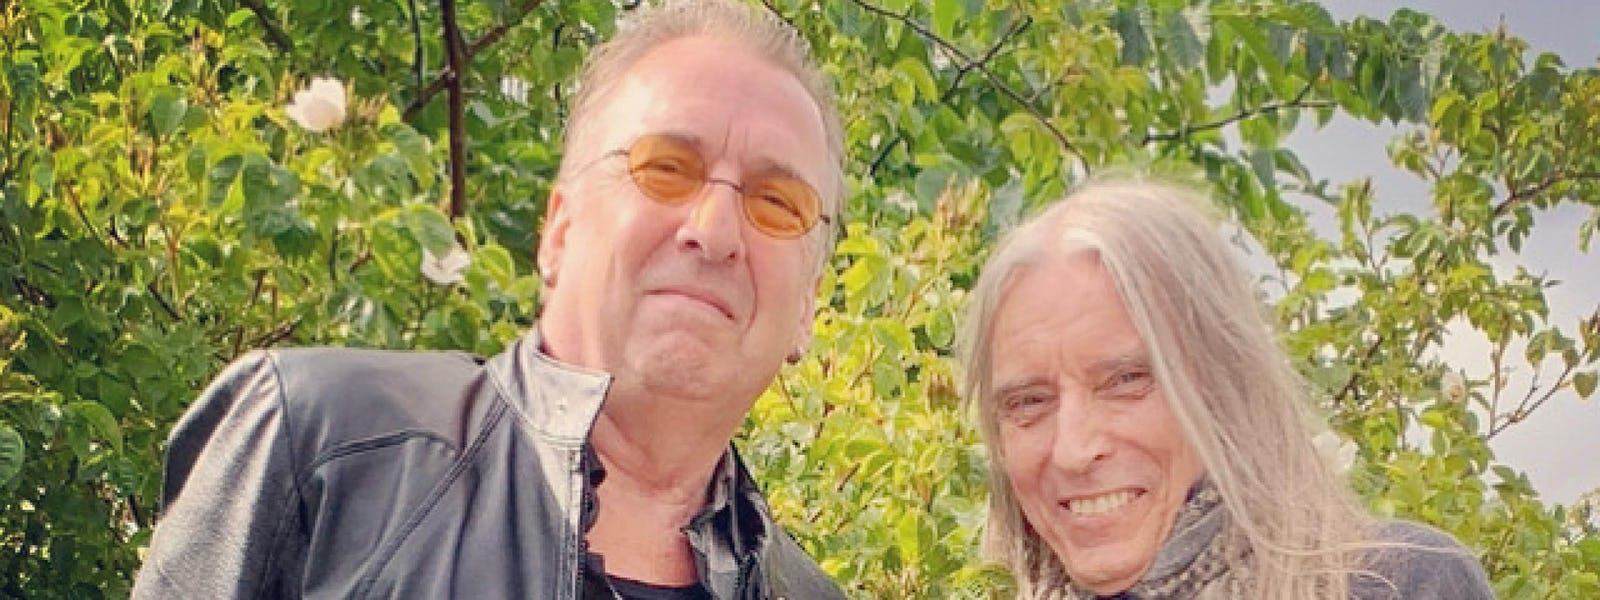 Bild - Äntligen Drive in konsert: Dan Hylander & Janne Bark